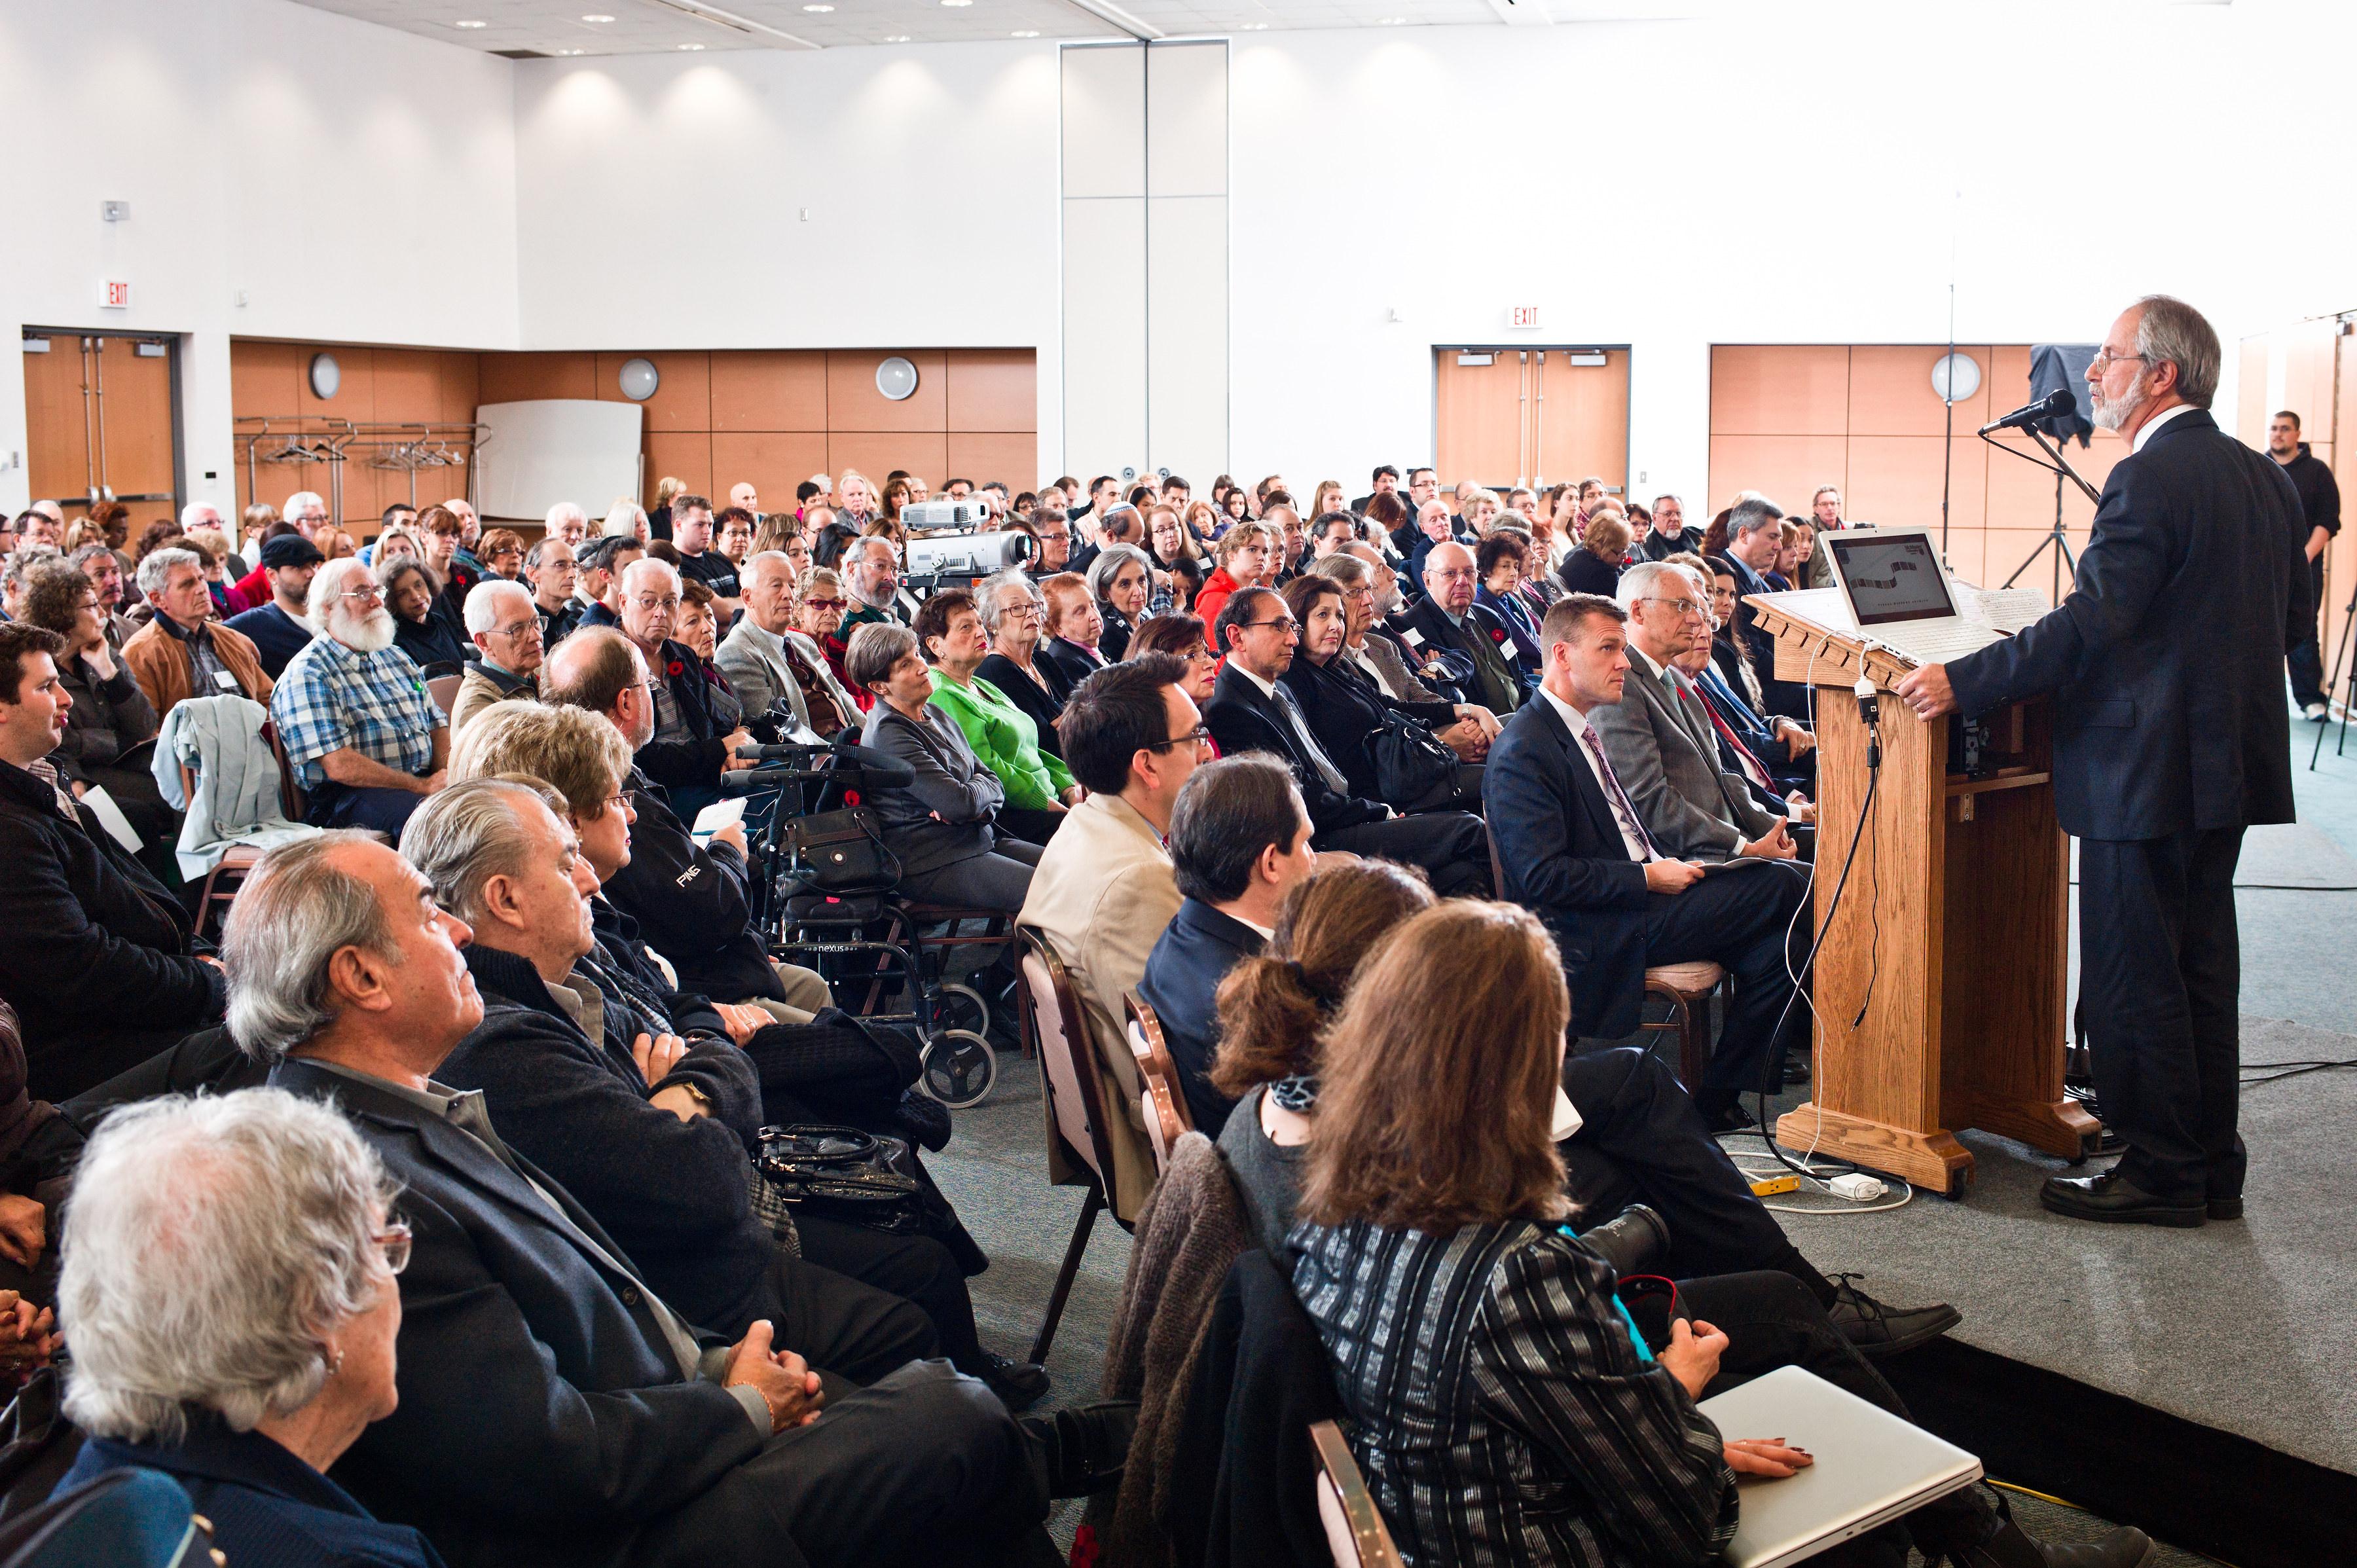 McMaster University President Patrick Dean addresses the audience.